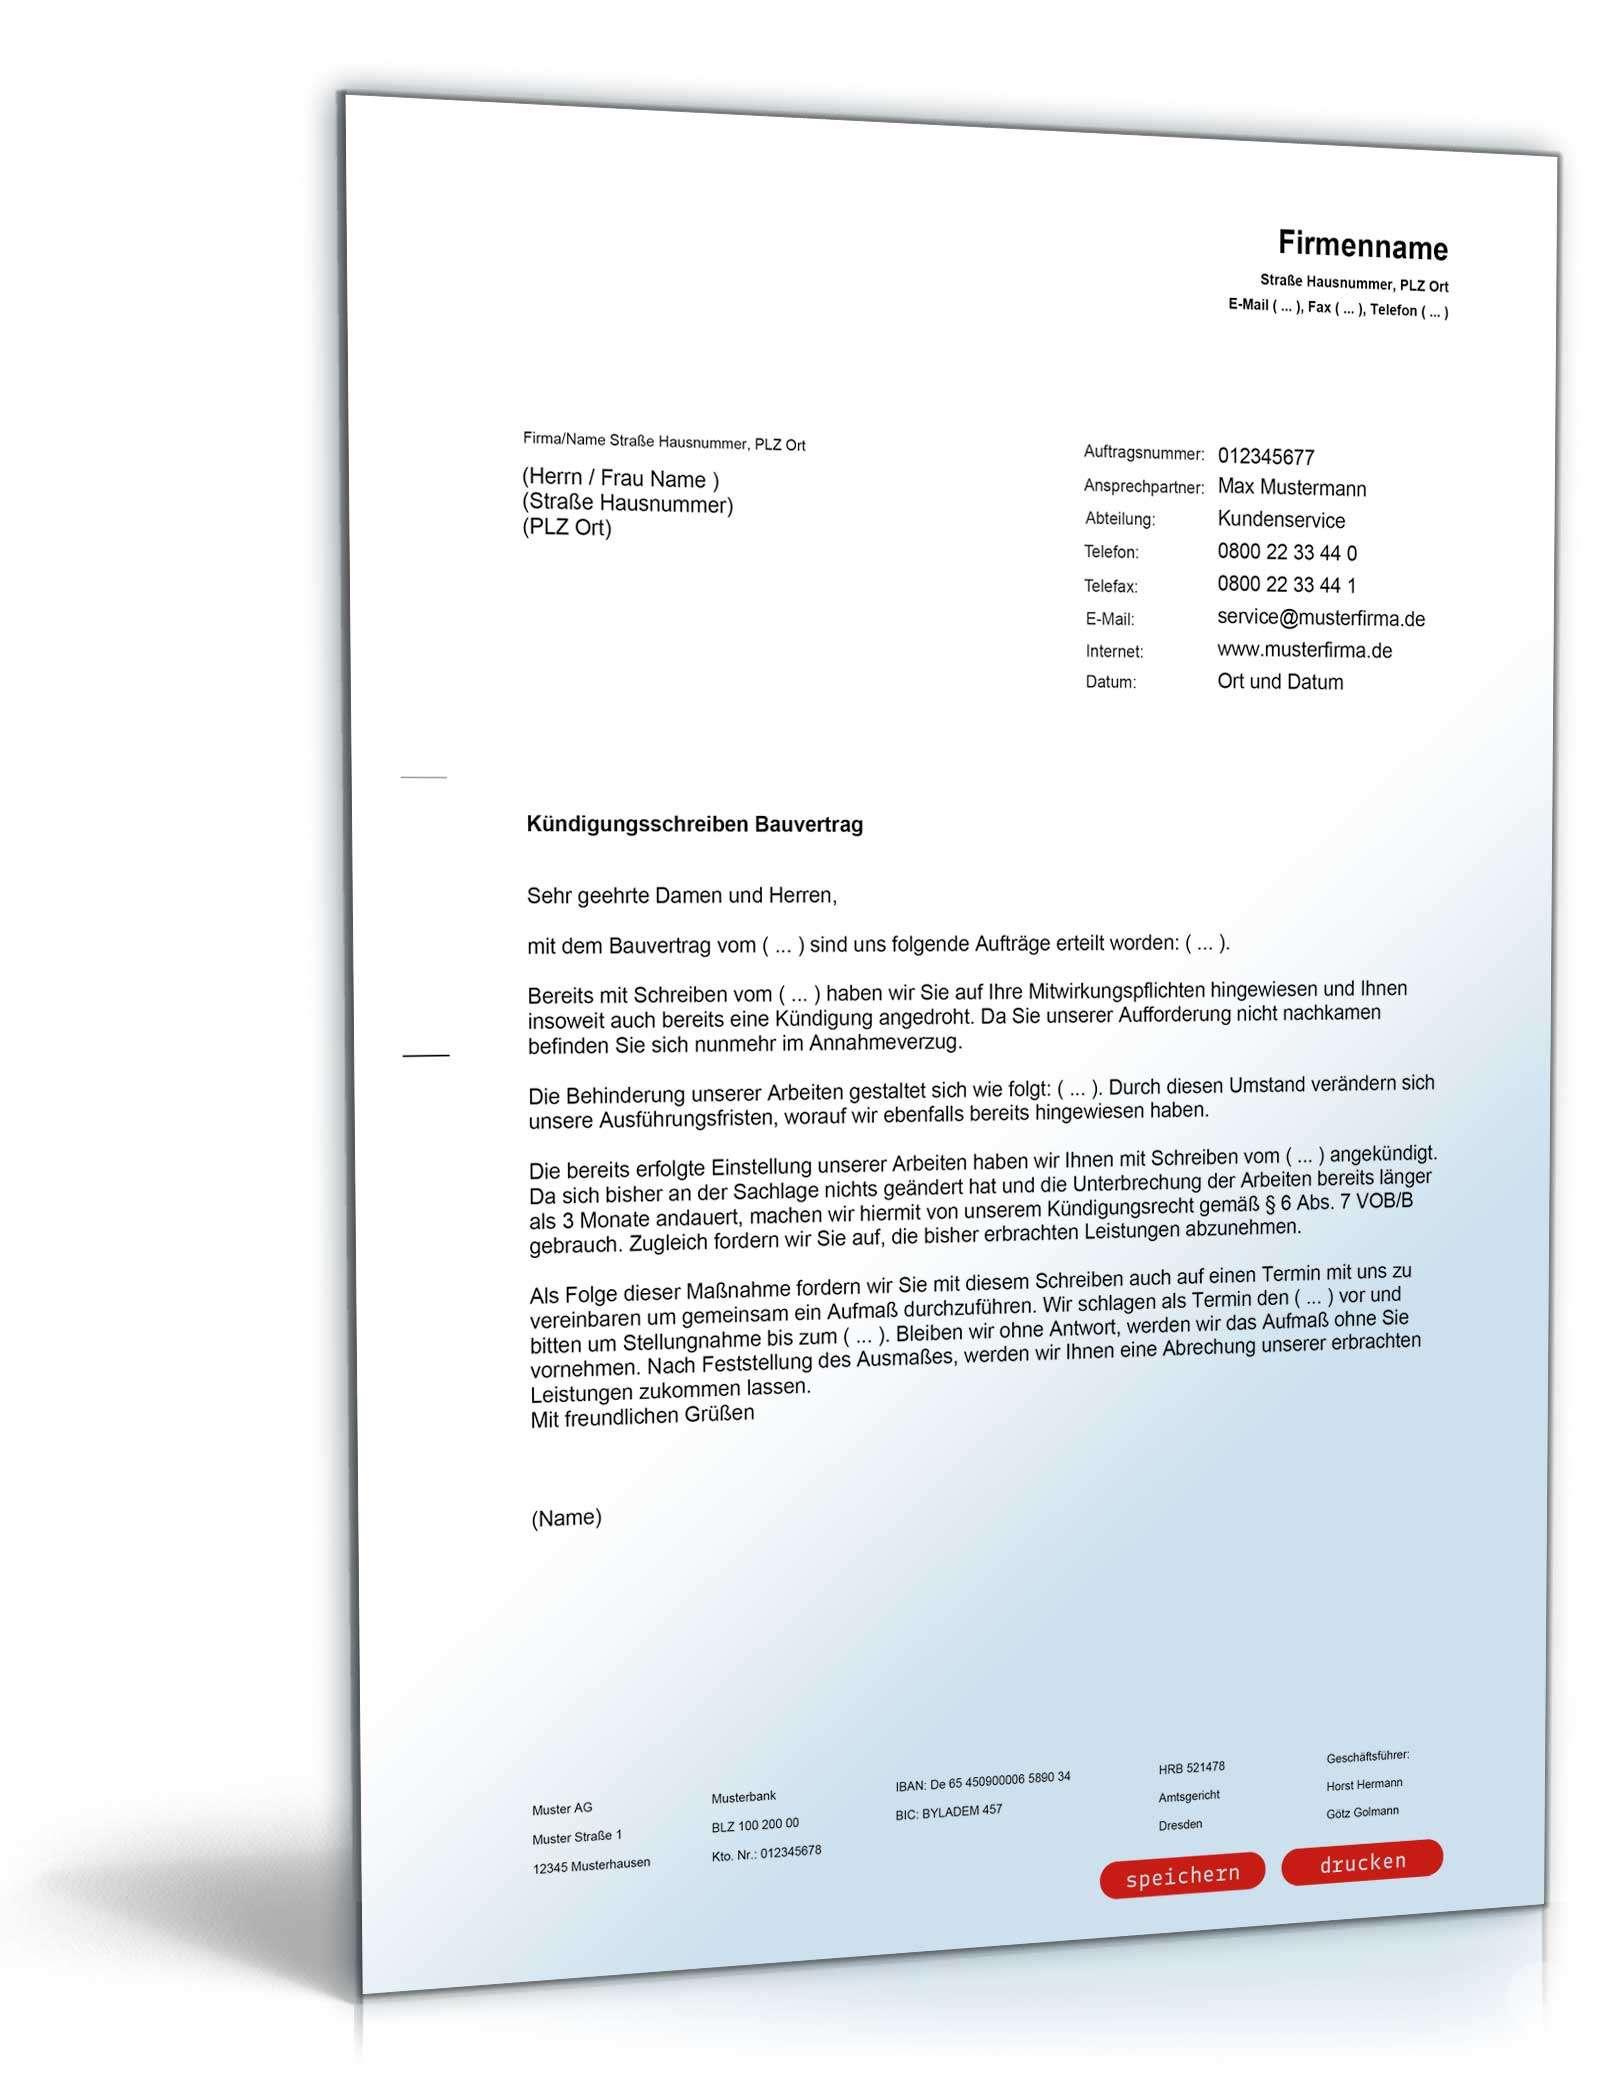 Kündigung Bauvertrag Muster Zum Download